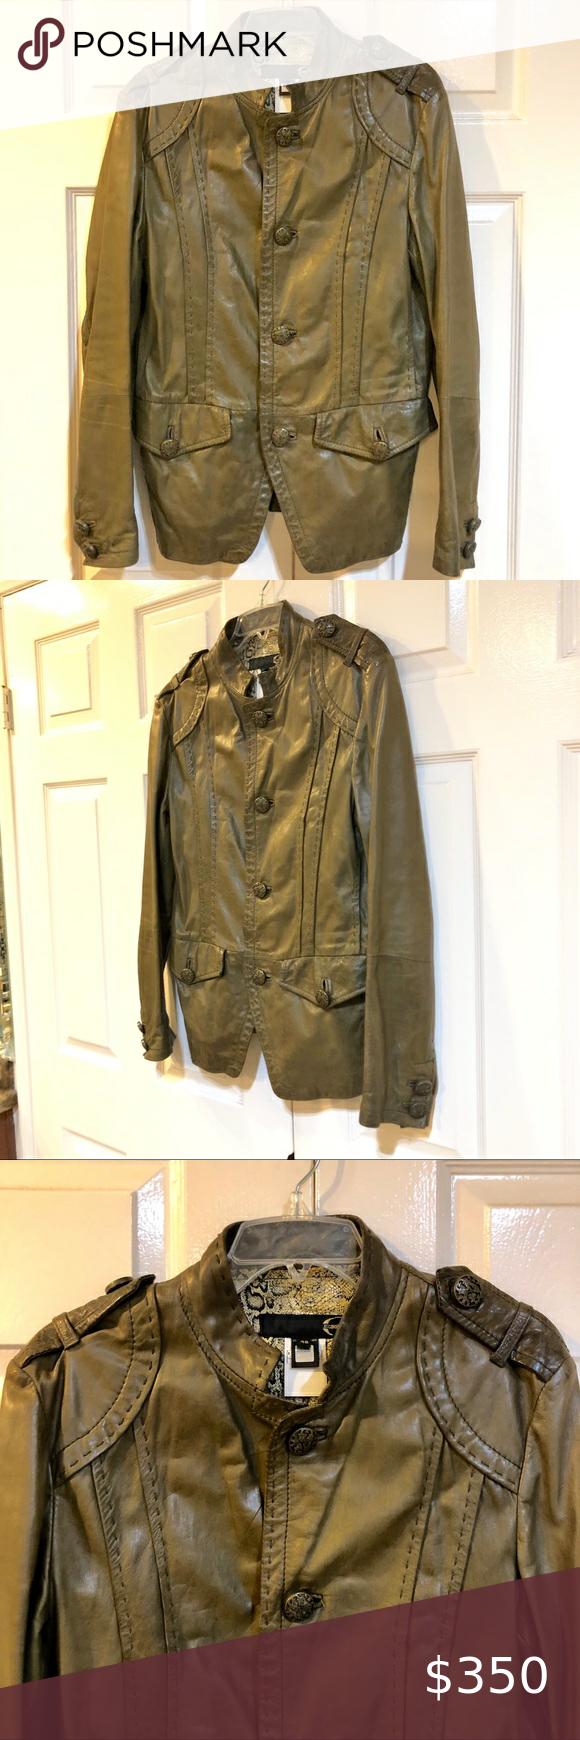 Just Cavalli Olive Green Leather Jacket Sz 48 Olive Green Leather Jacket Green Leather Jackets Just Cavalli [ 1740 x 580 Pixel ]